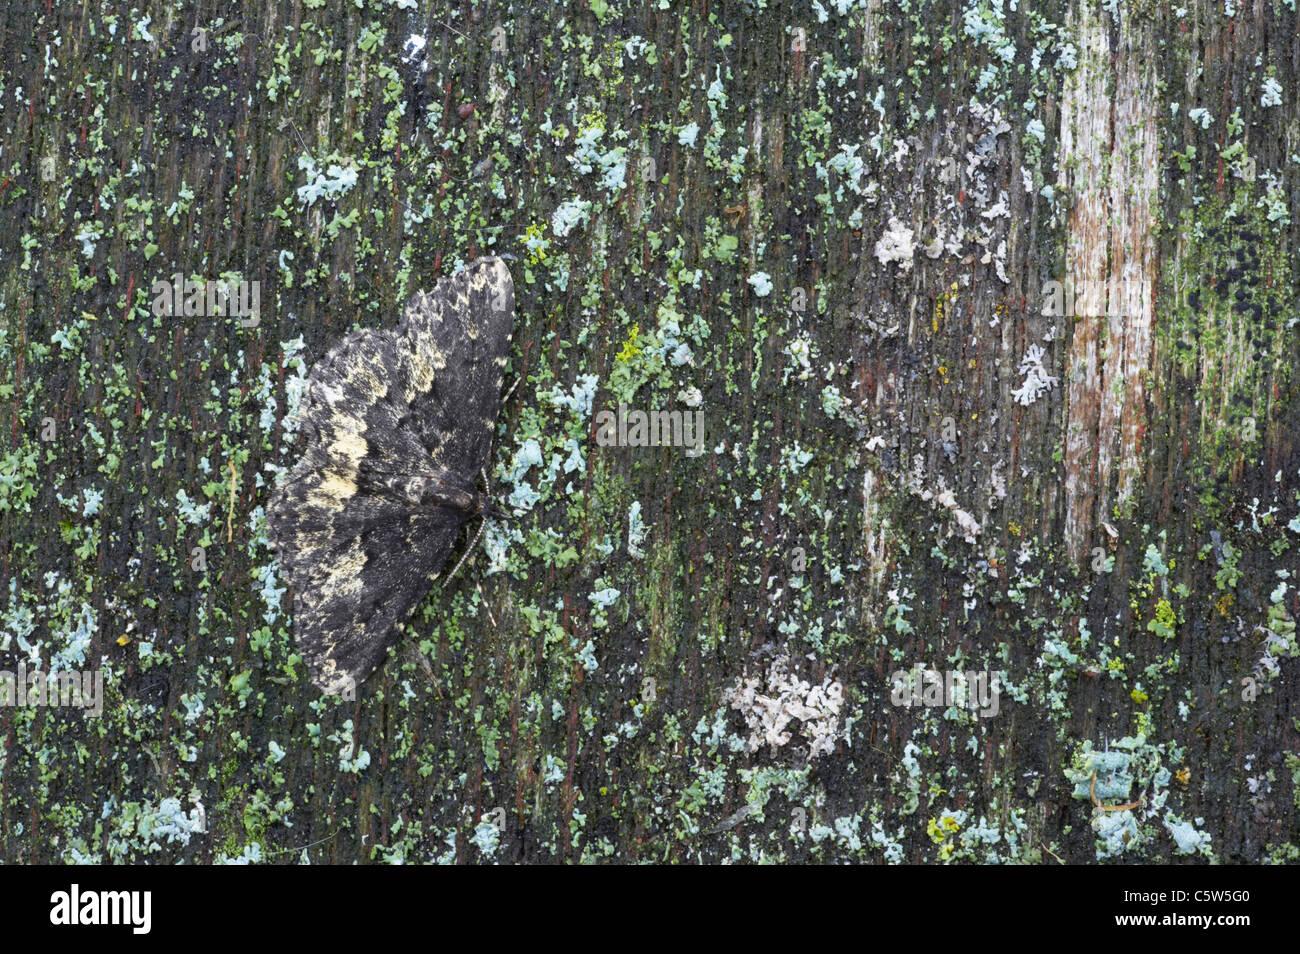 Waved Black Moth - Demonstrating camouflage Parascotia fuliginaria Essex, UK IN000692 - Stock Image